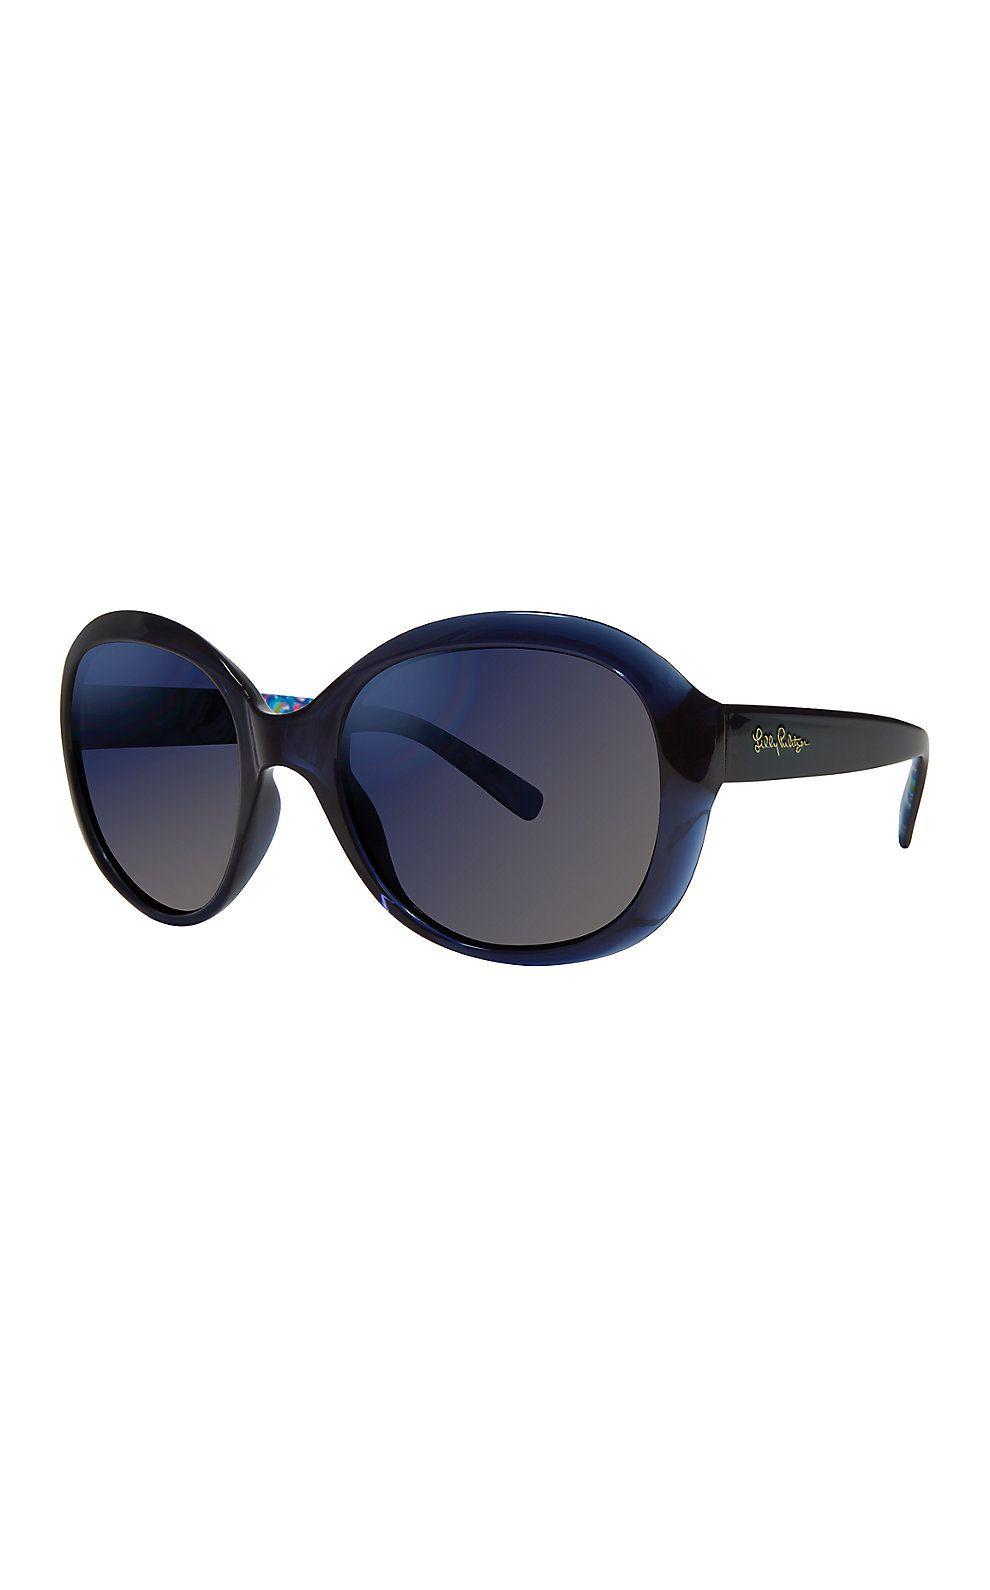 3415431db069b6 Lilly Pulitzer Magnolia Sunglasses   Pinterest